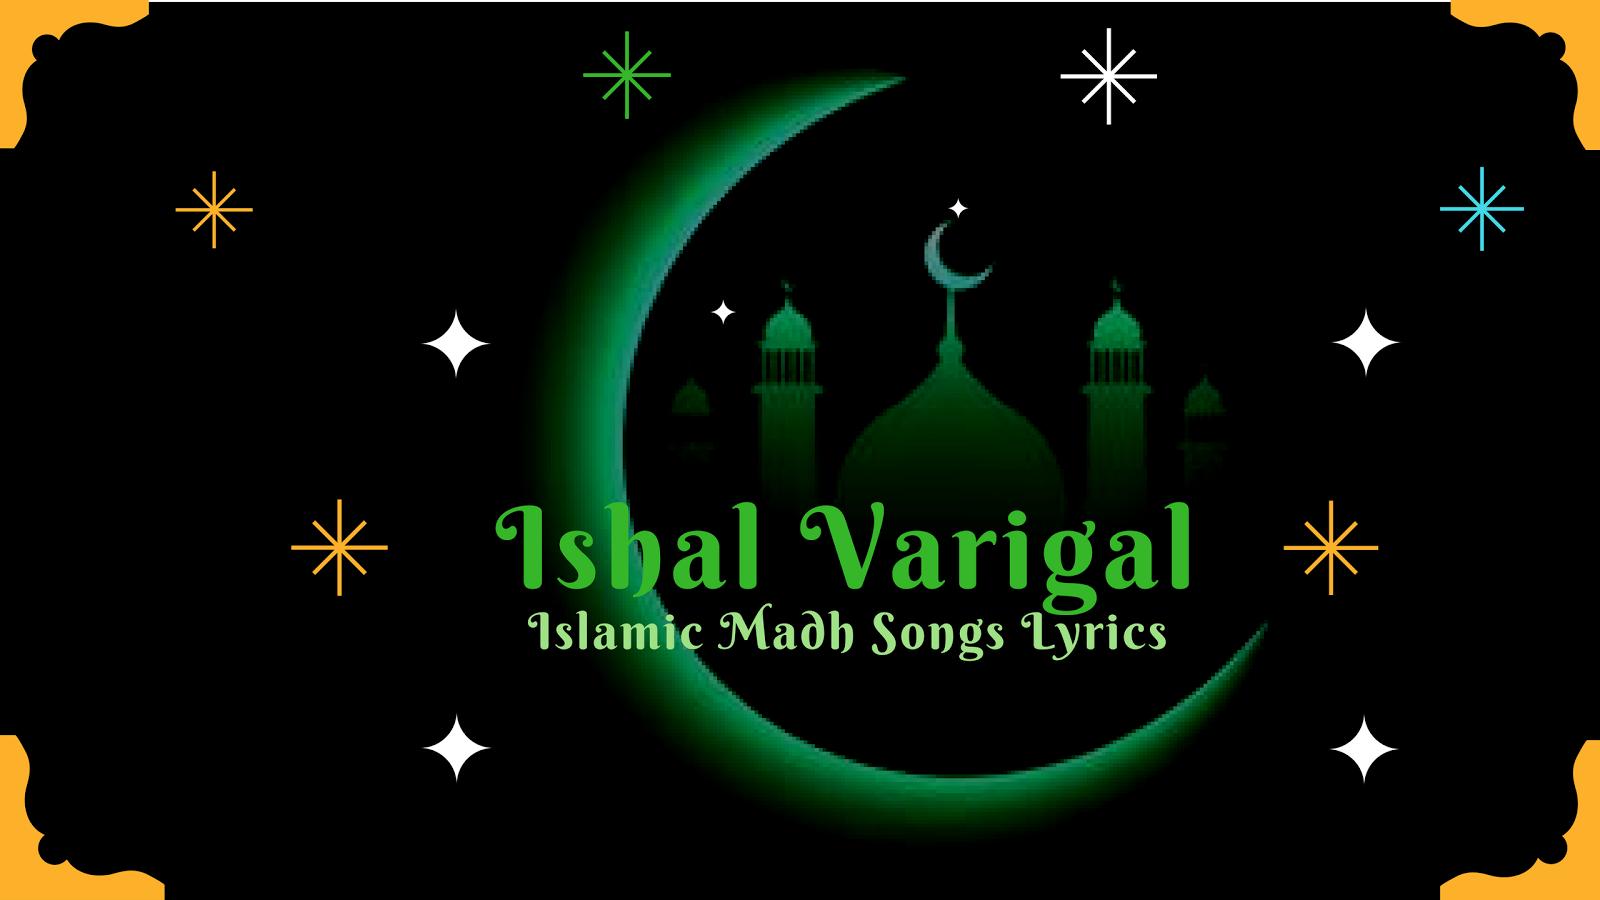 Ishal Varigal